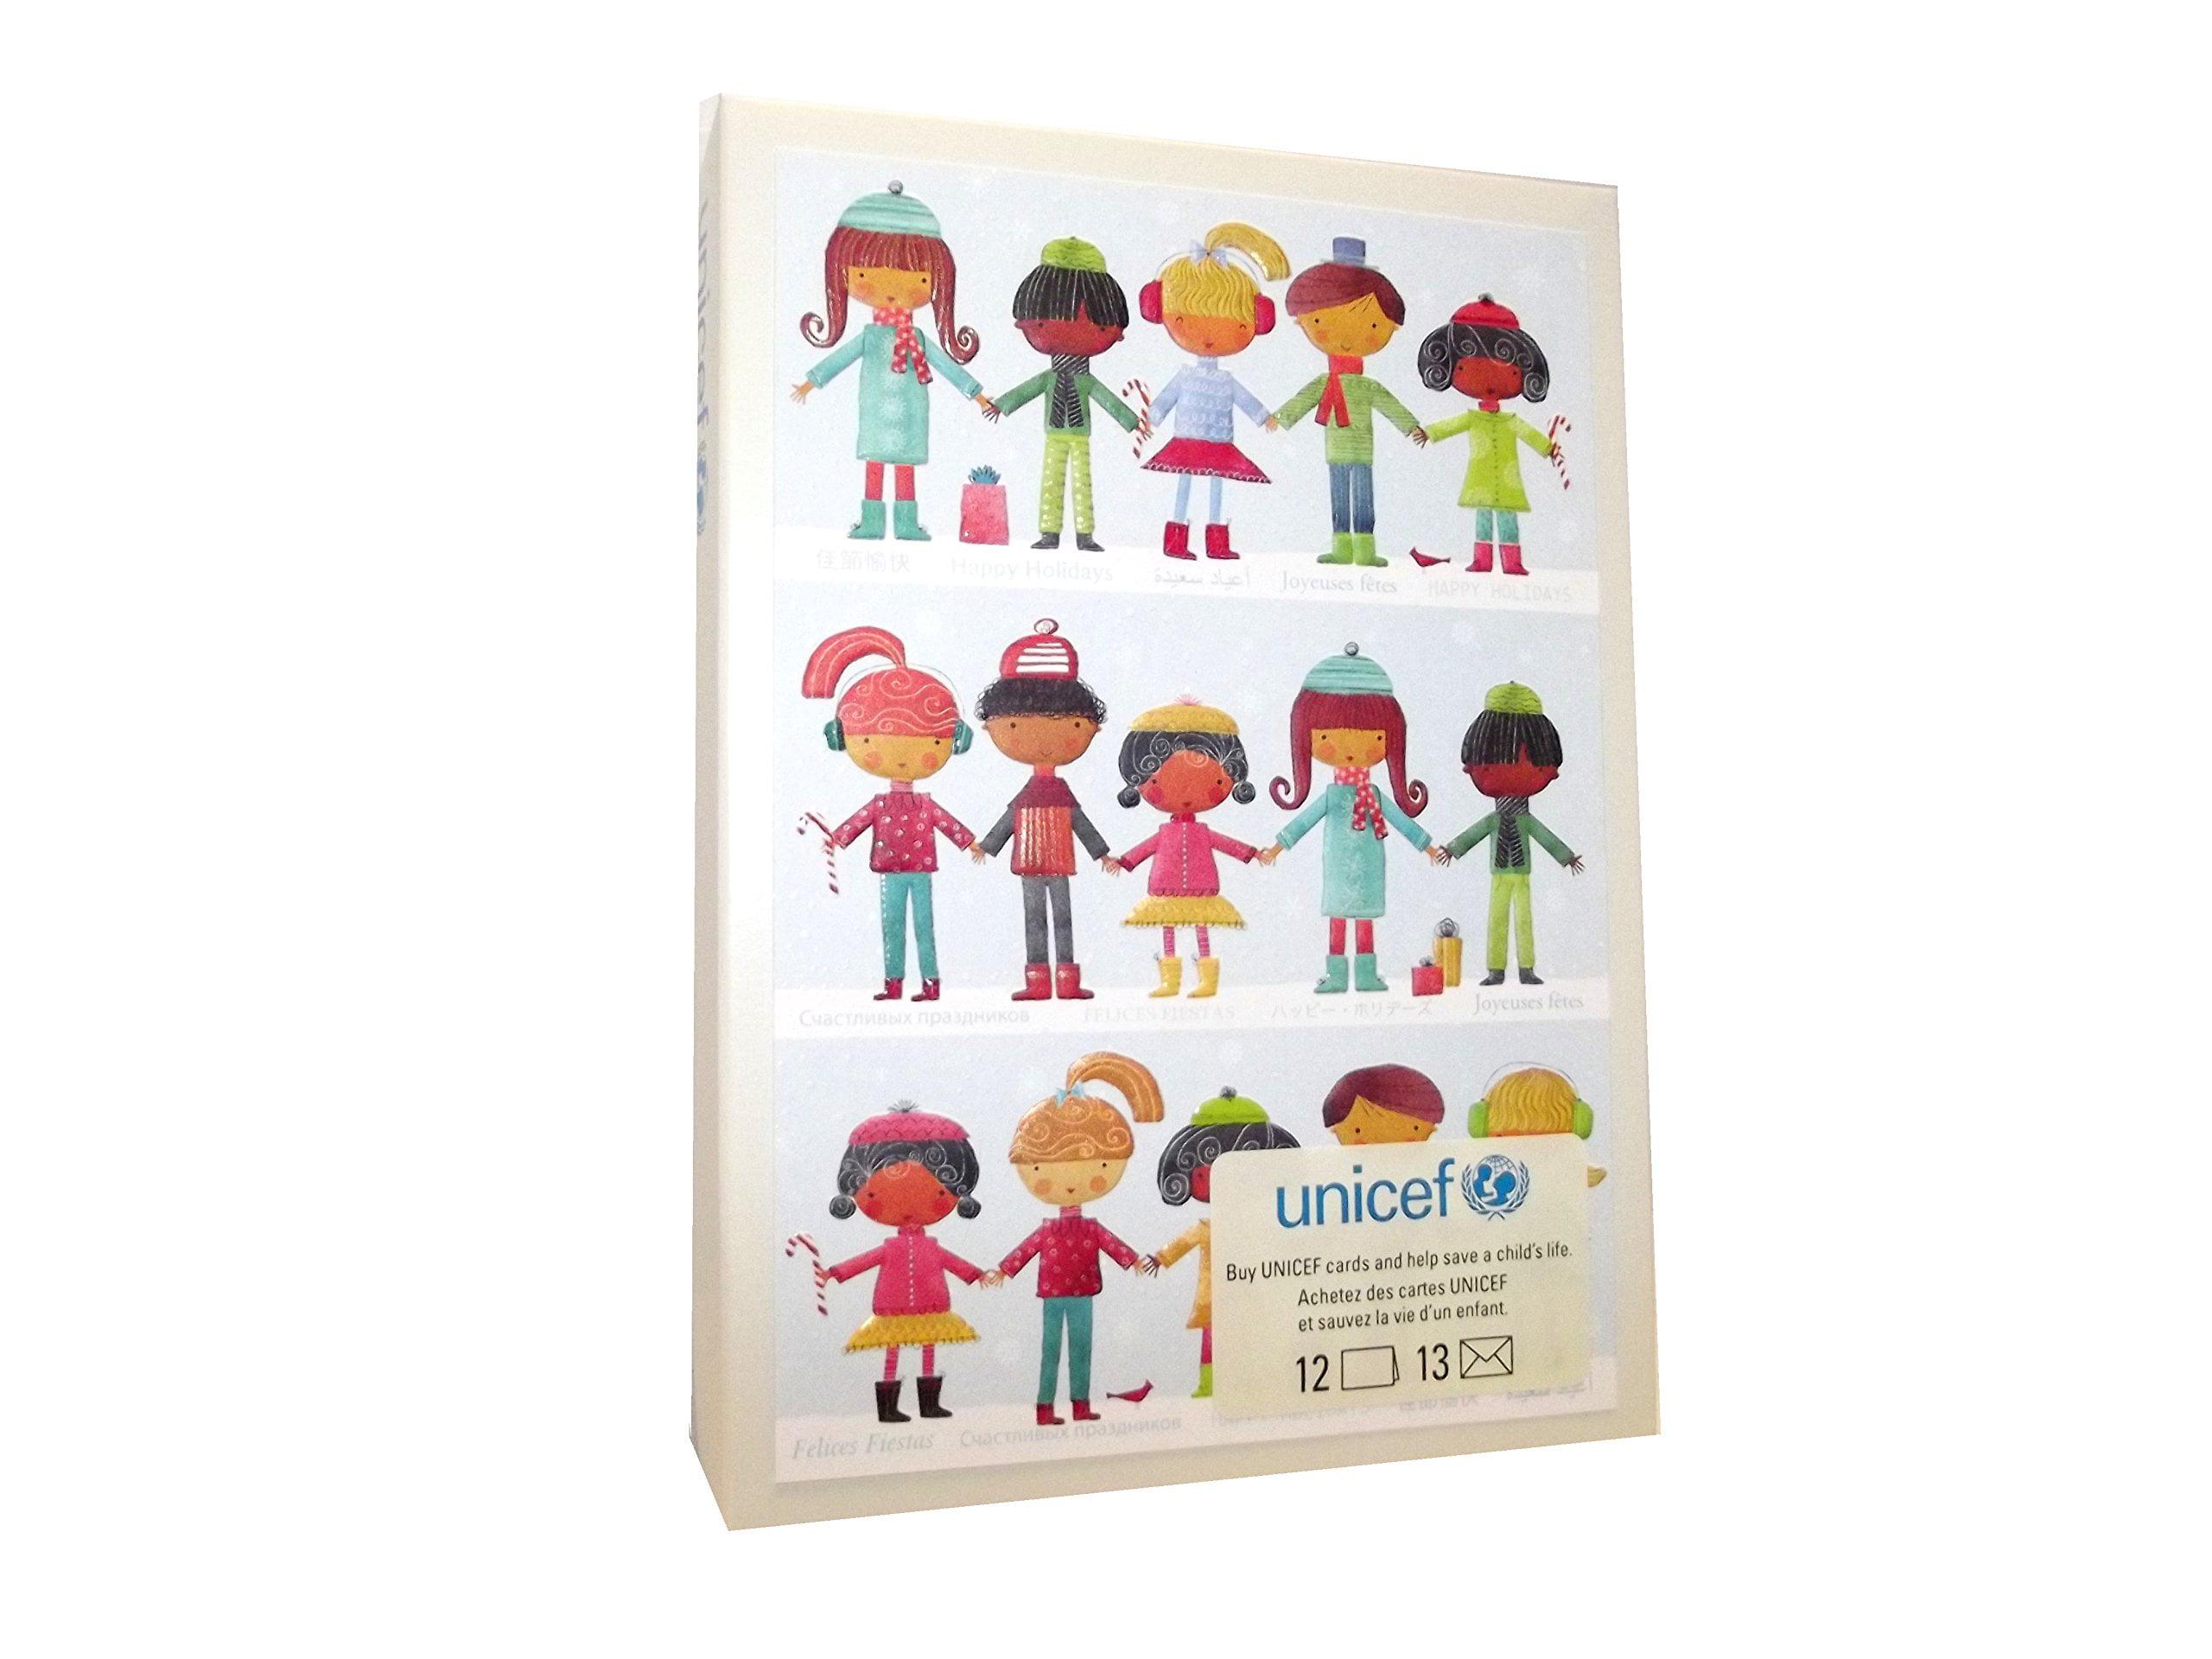 UNICEF HOLIDAY CARDS (CHILDREN) - Walmart.com